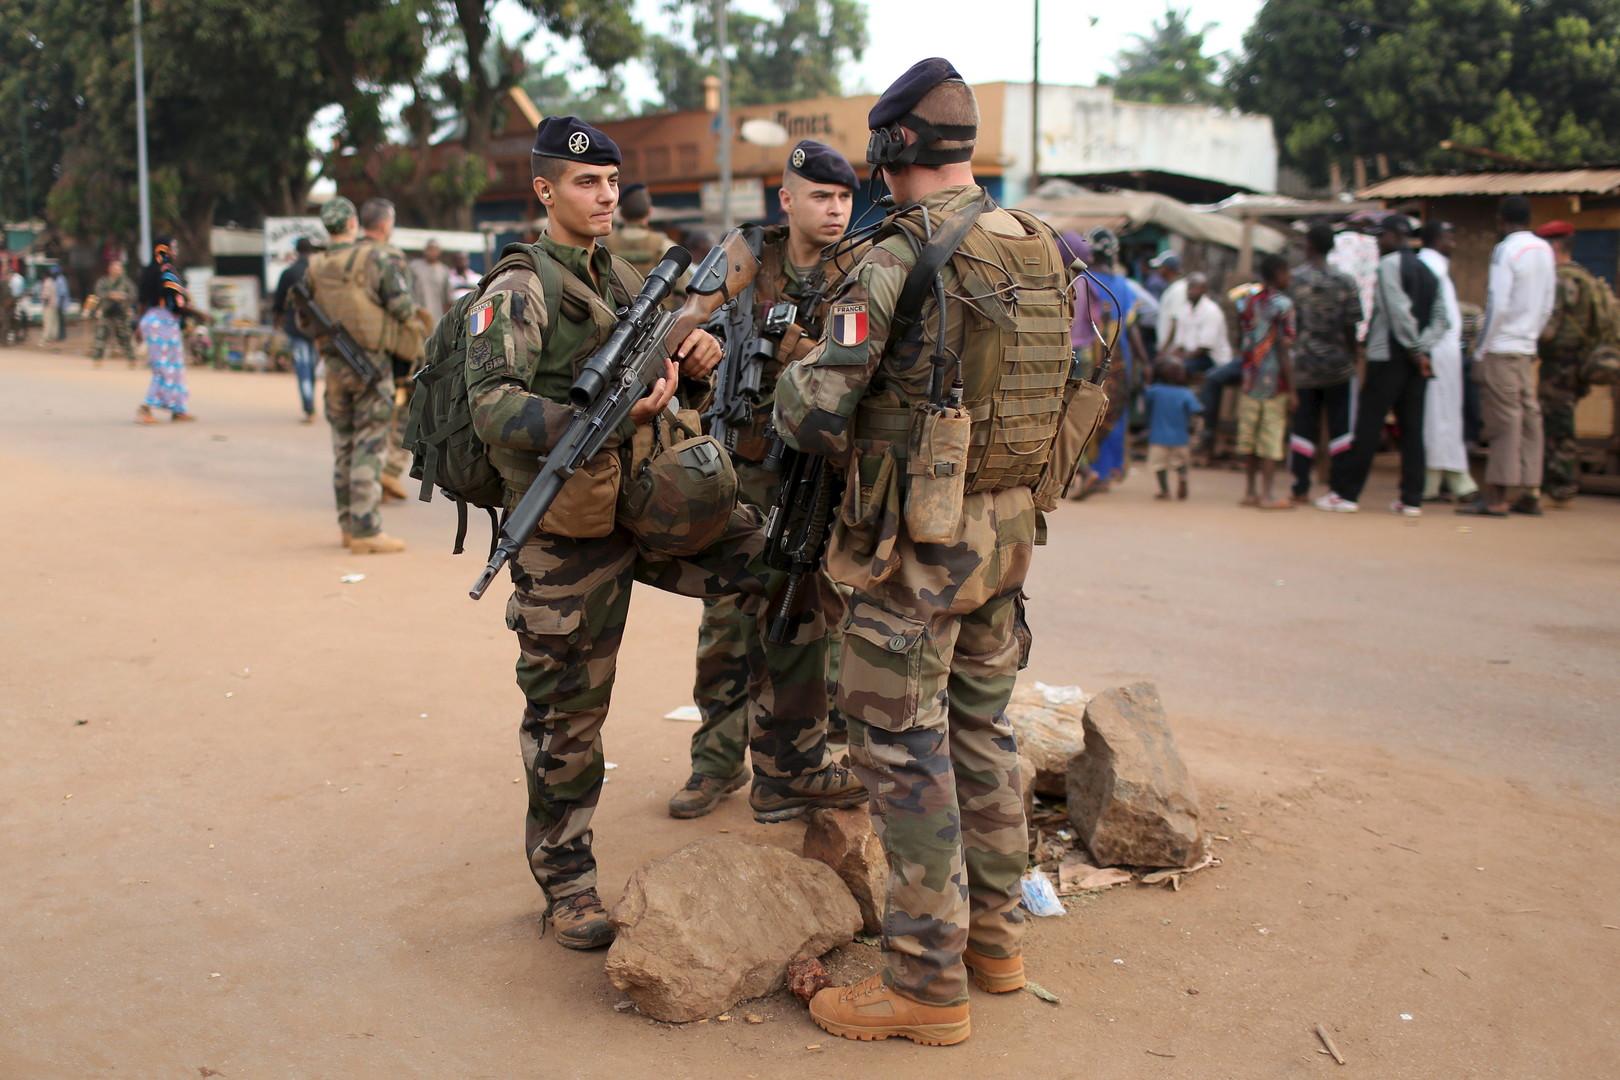 quatre soldats fran ais accus s de viol en centrafrique. Black Bedroom Furniture Sets. Home Design Ideas